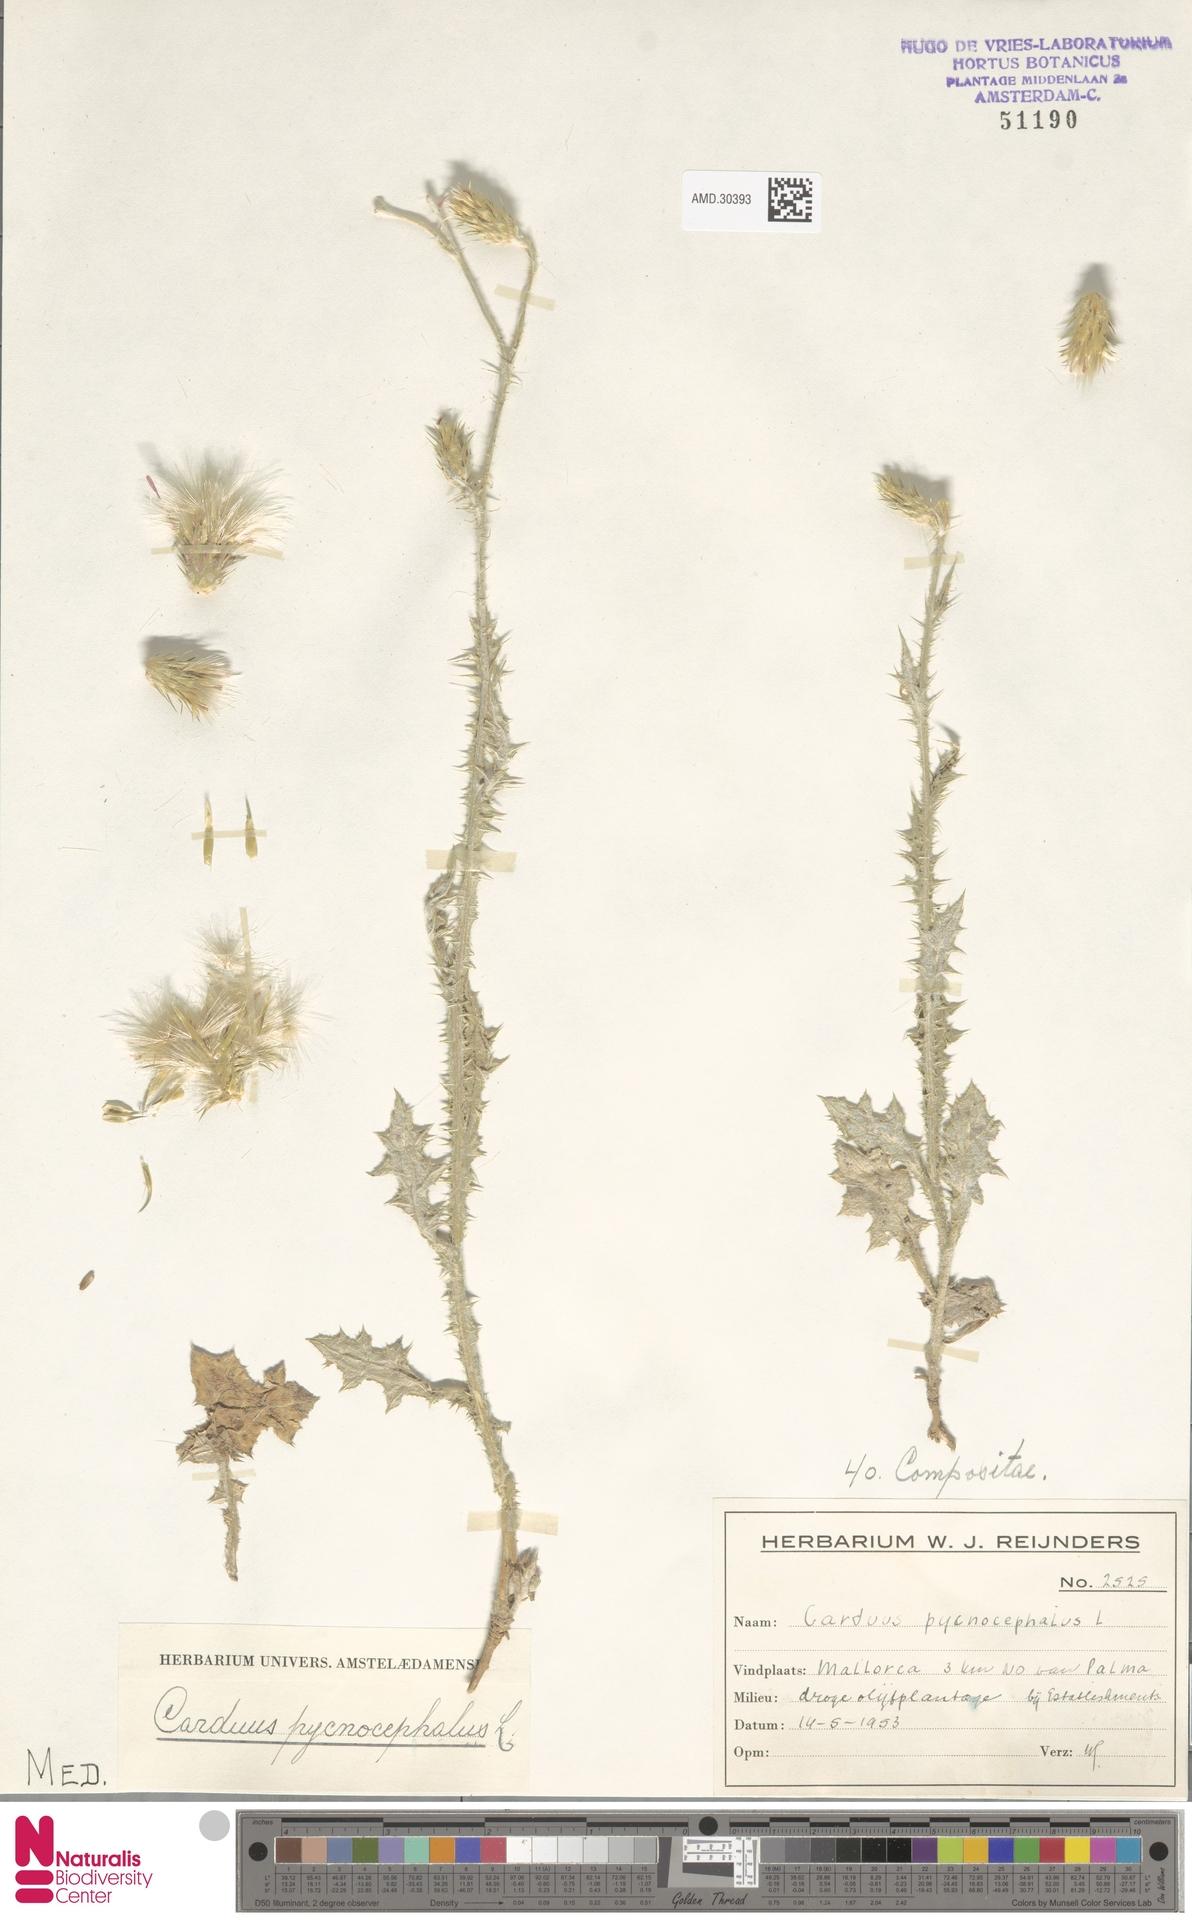 AMD.30393 | Carduus pycnocephalus L.